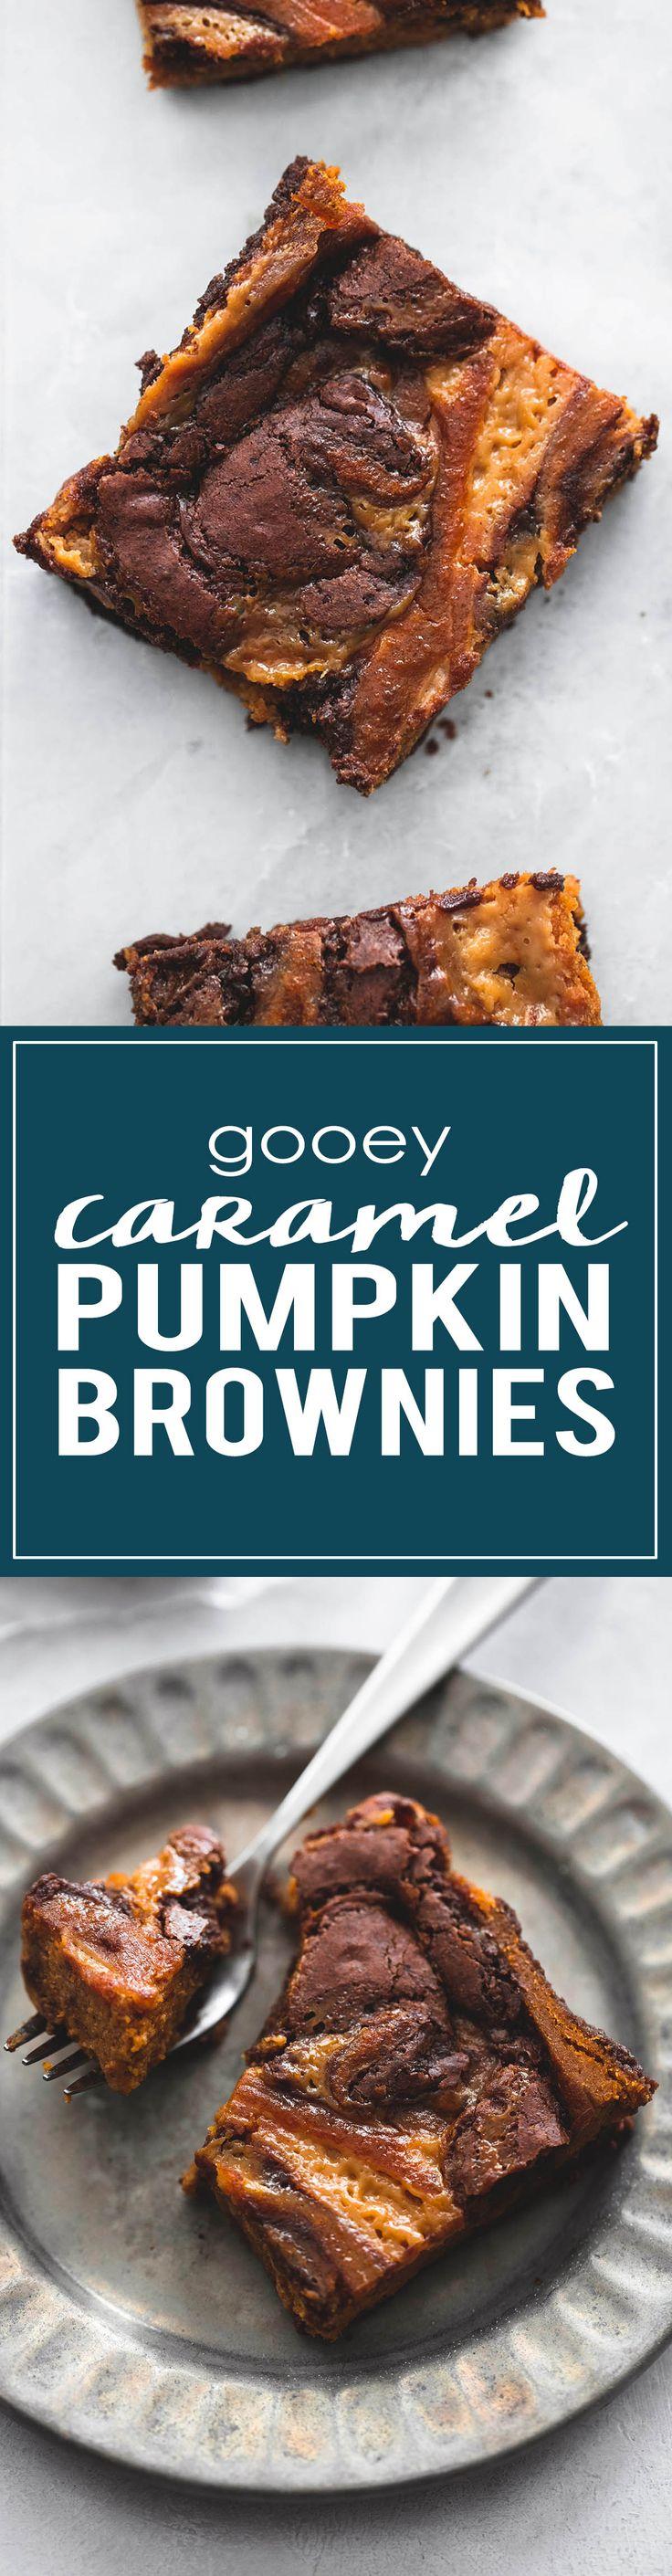 Gooey Caramel Pumpkin Brownies | lecremedelacrumb.com